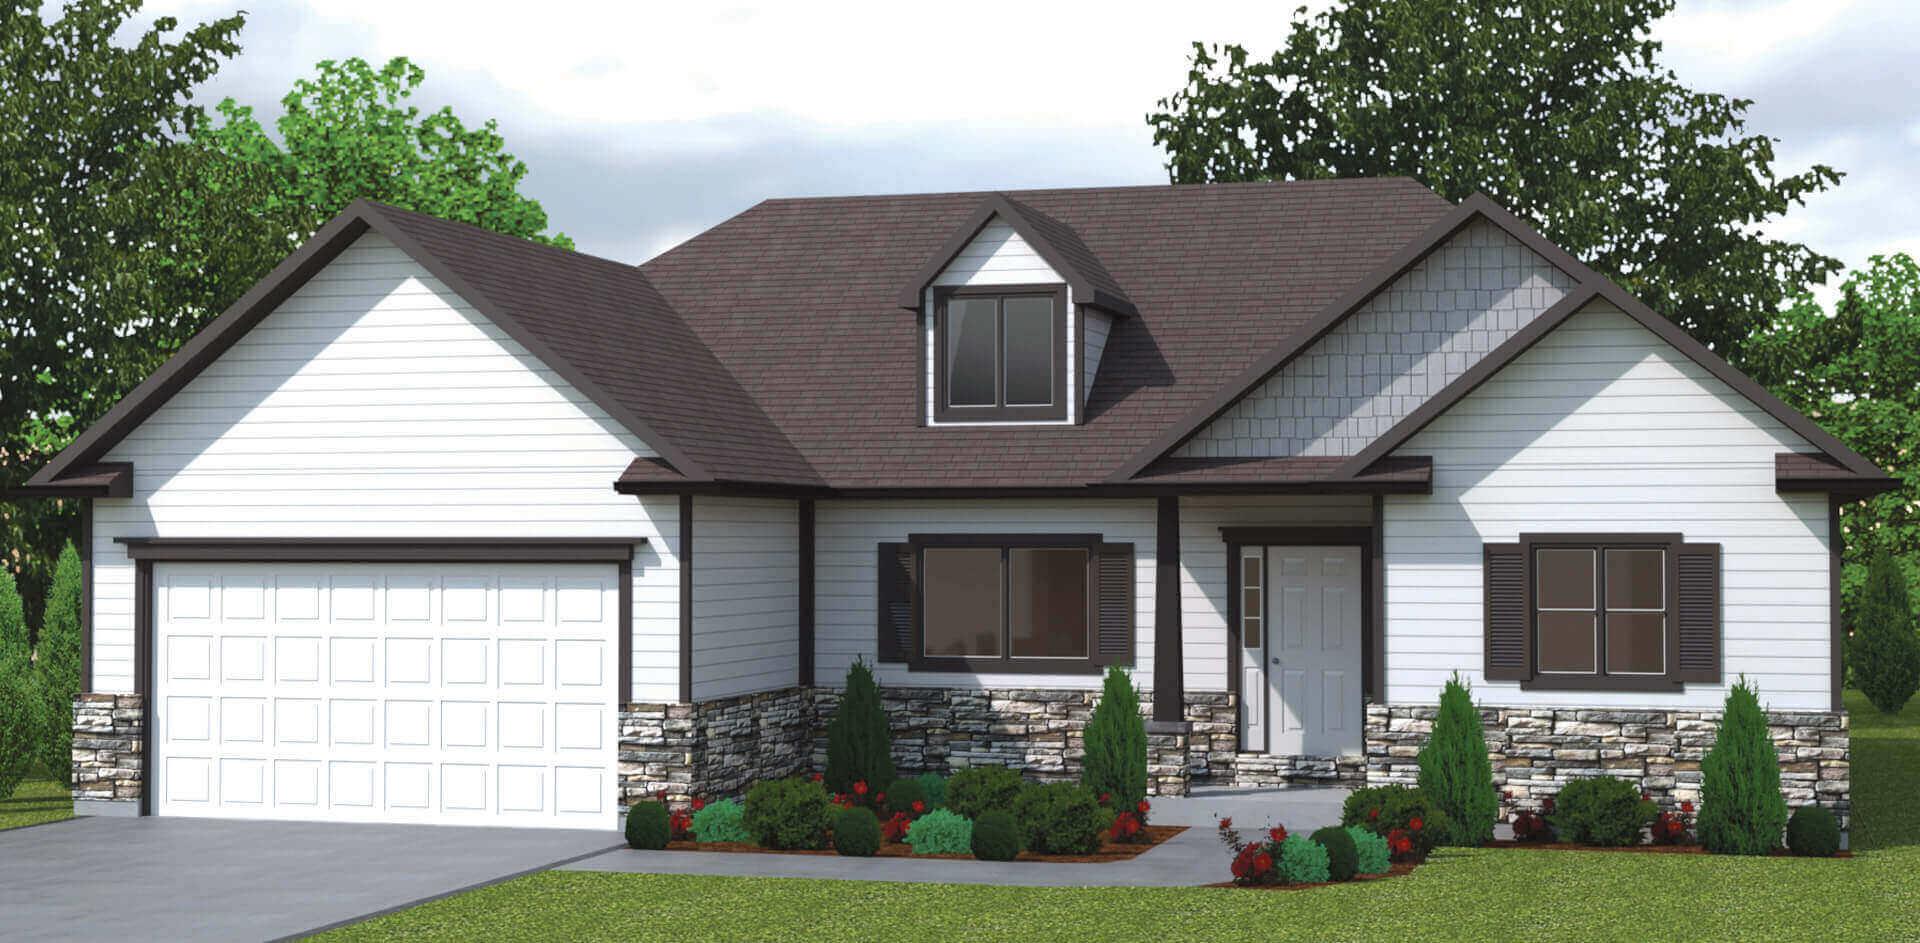 1615 house elevation